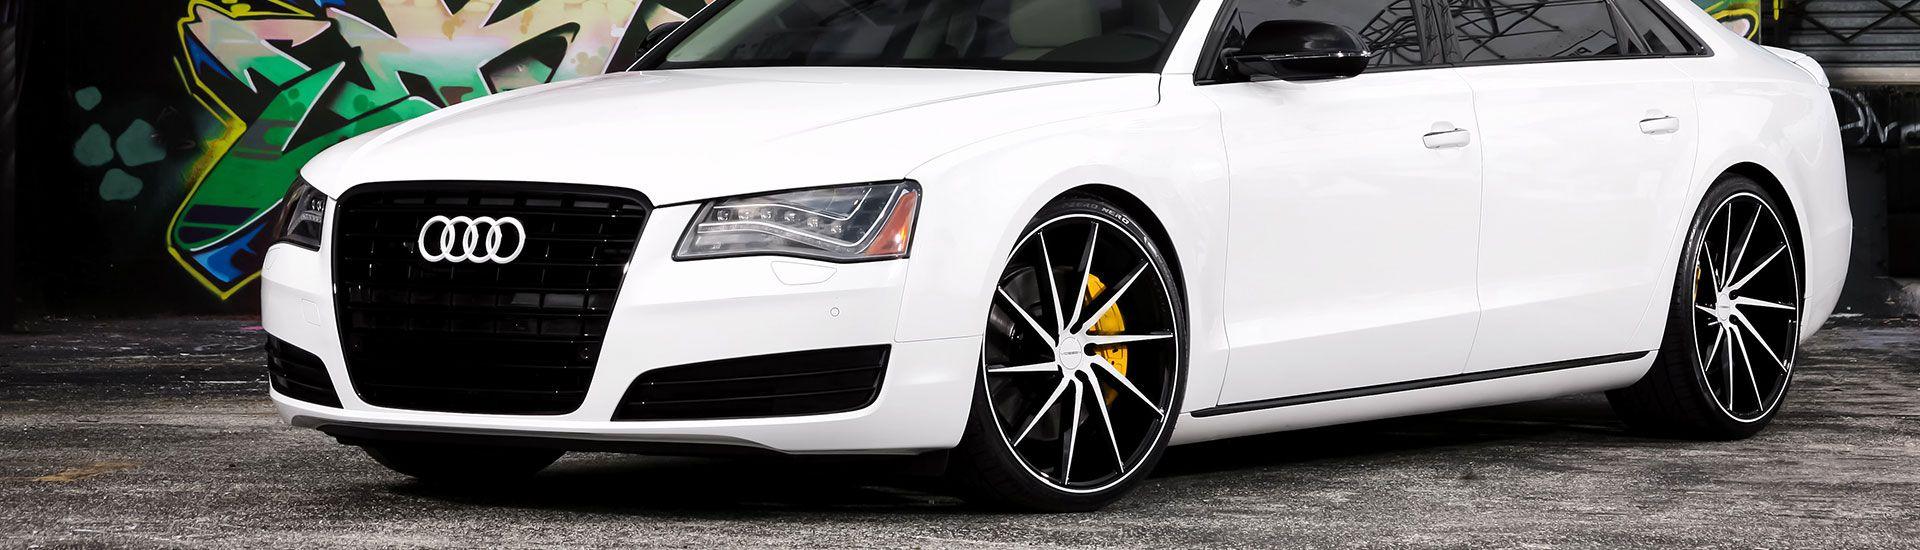 Audi A8 Window Tint